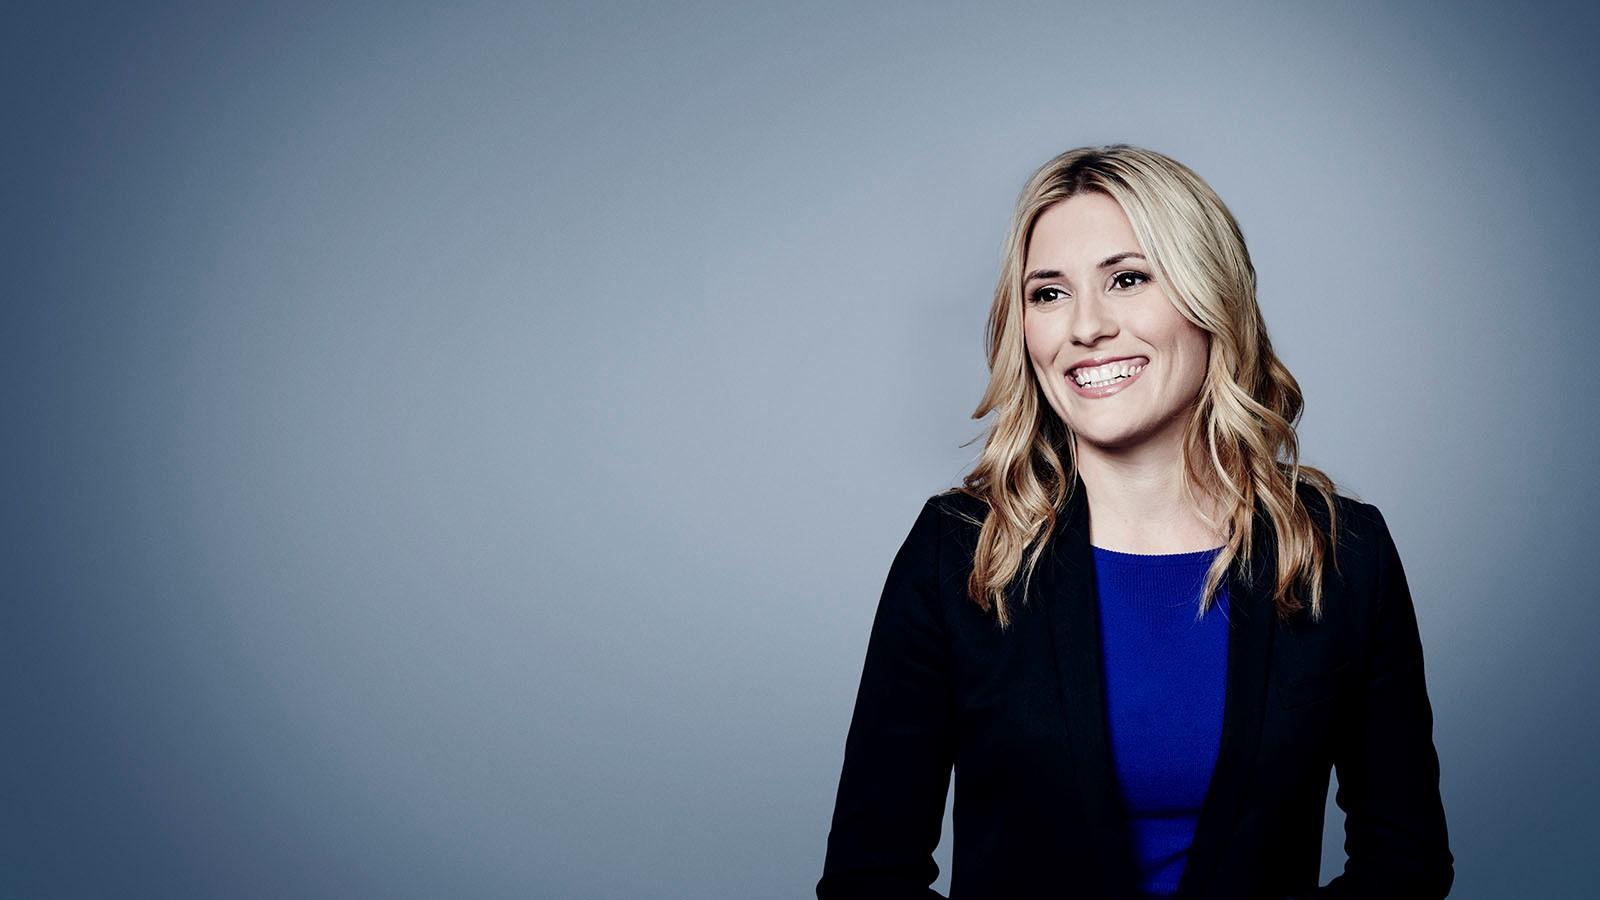 Cnn Profiles Erin Mclaughlin Correspondent Cnn Com